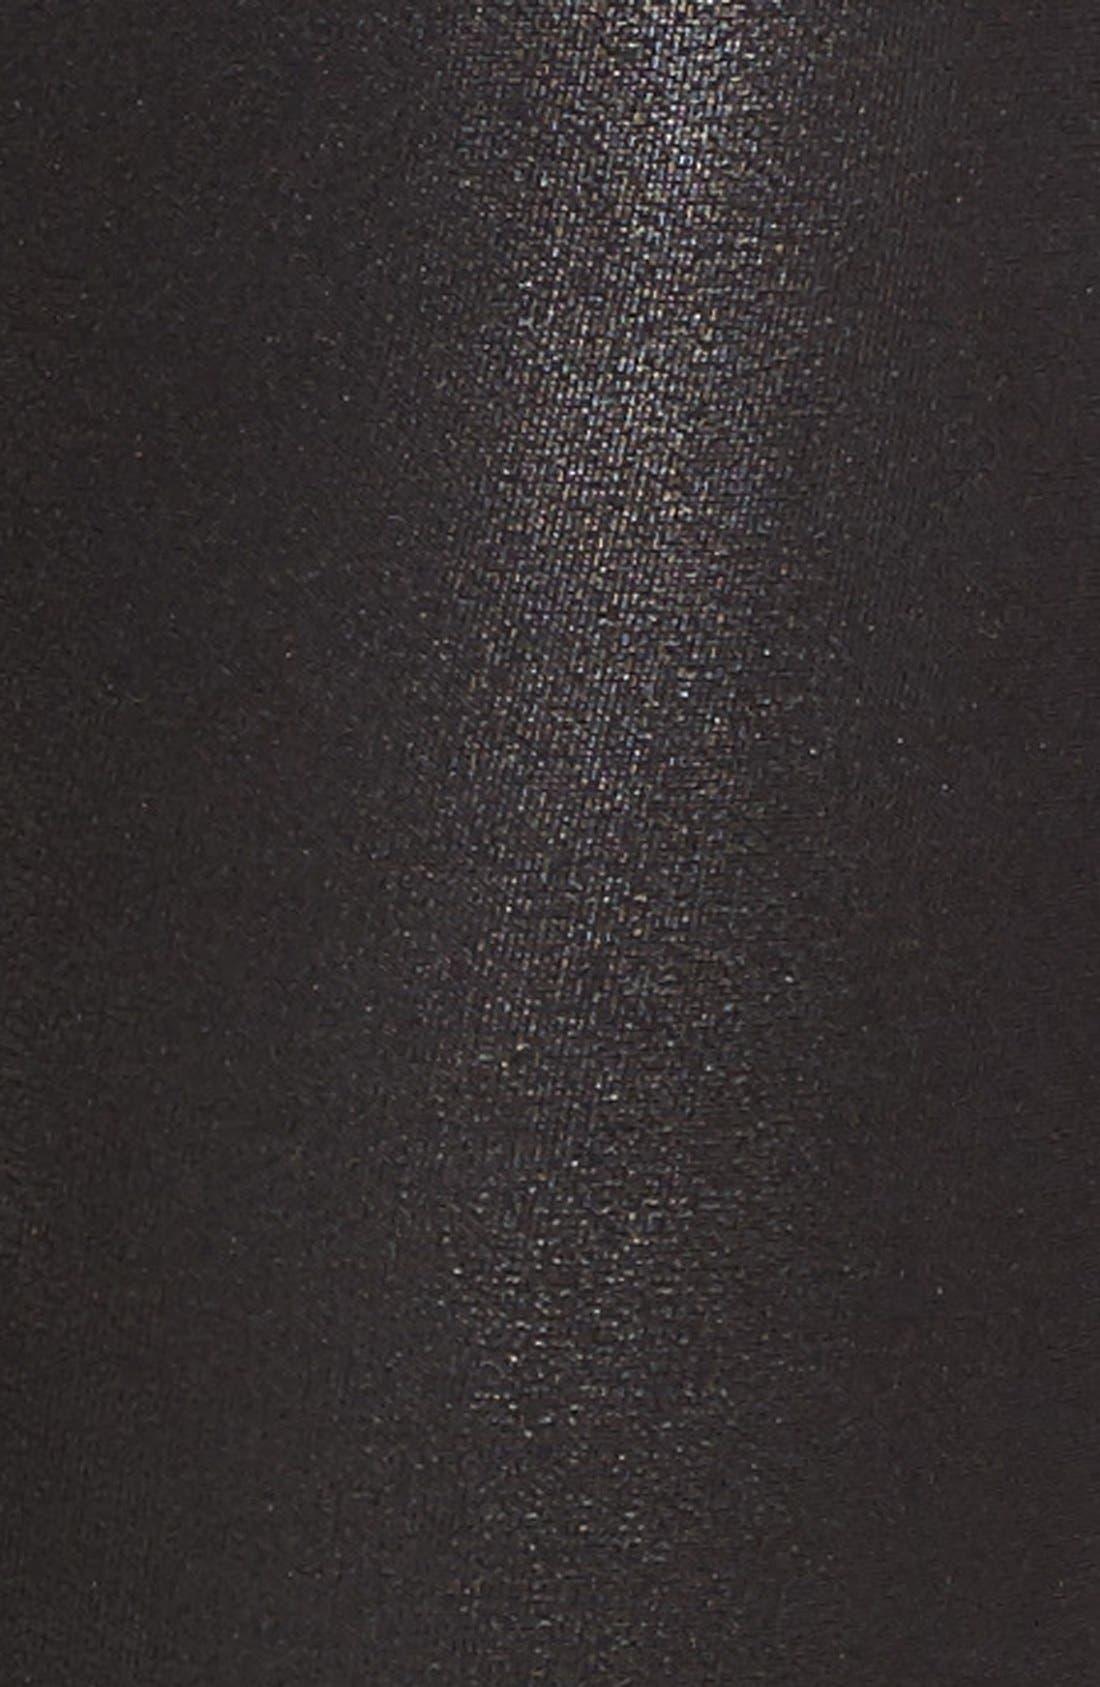 SPANX<SUP>®</SUP>, Faux Leather Leggings, Alternate thumbnail 9, color, BLACK